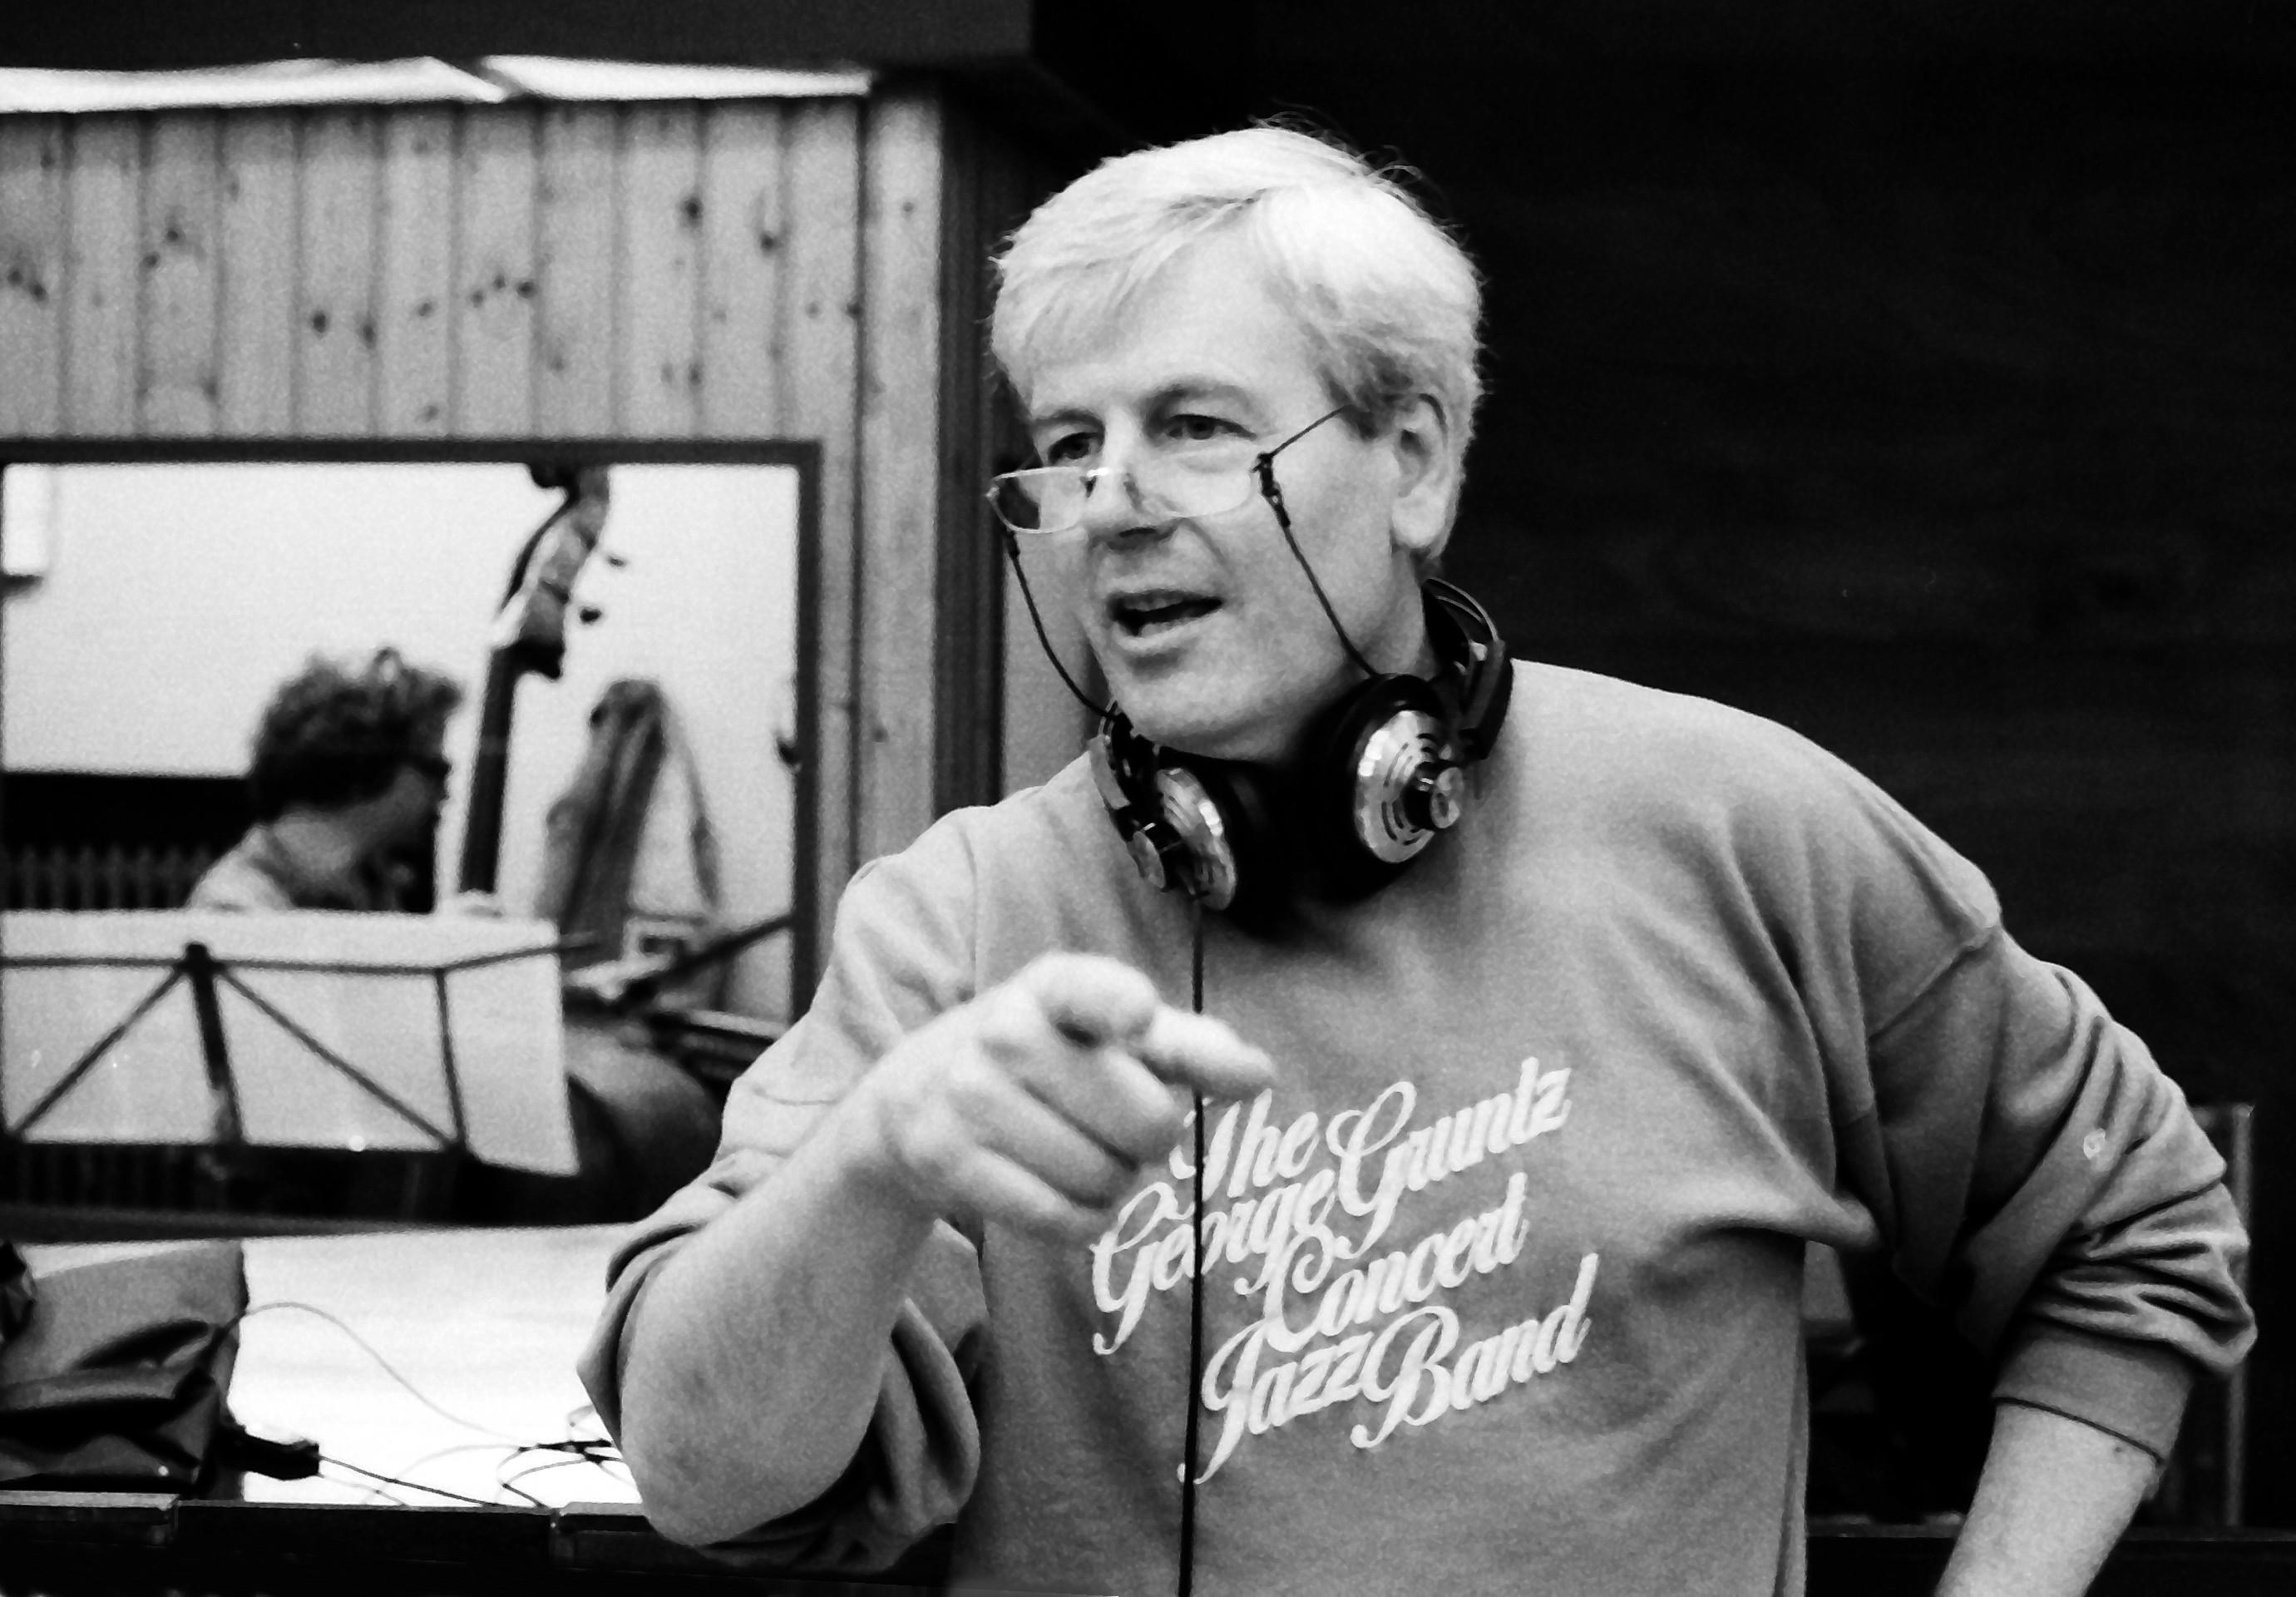 George Gruntz P, Comp 1932-2013